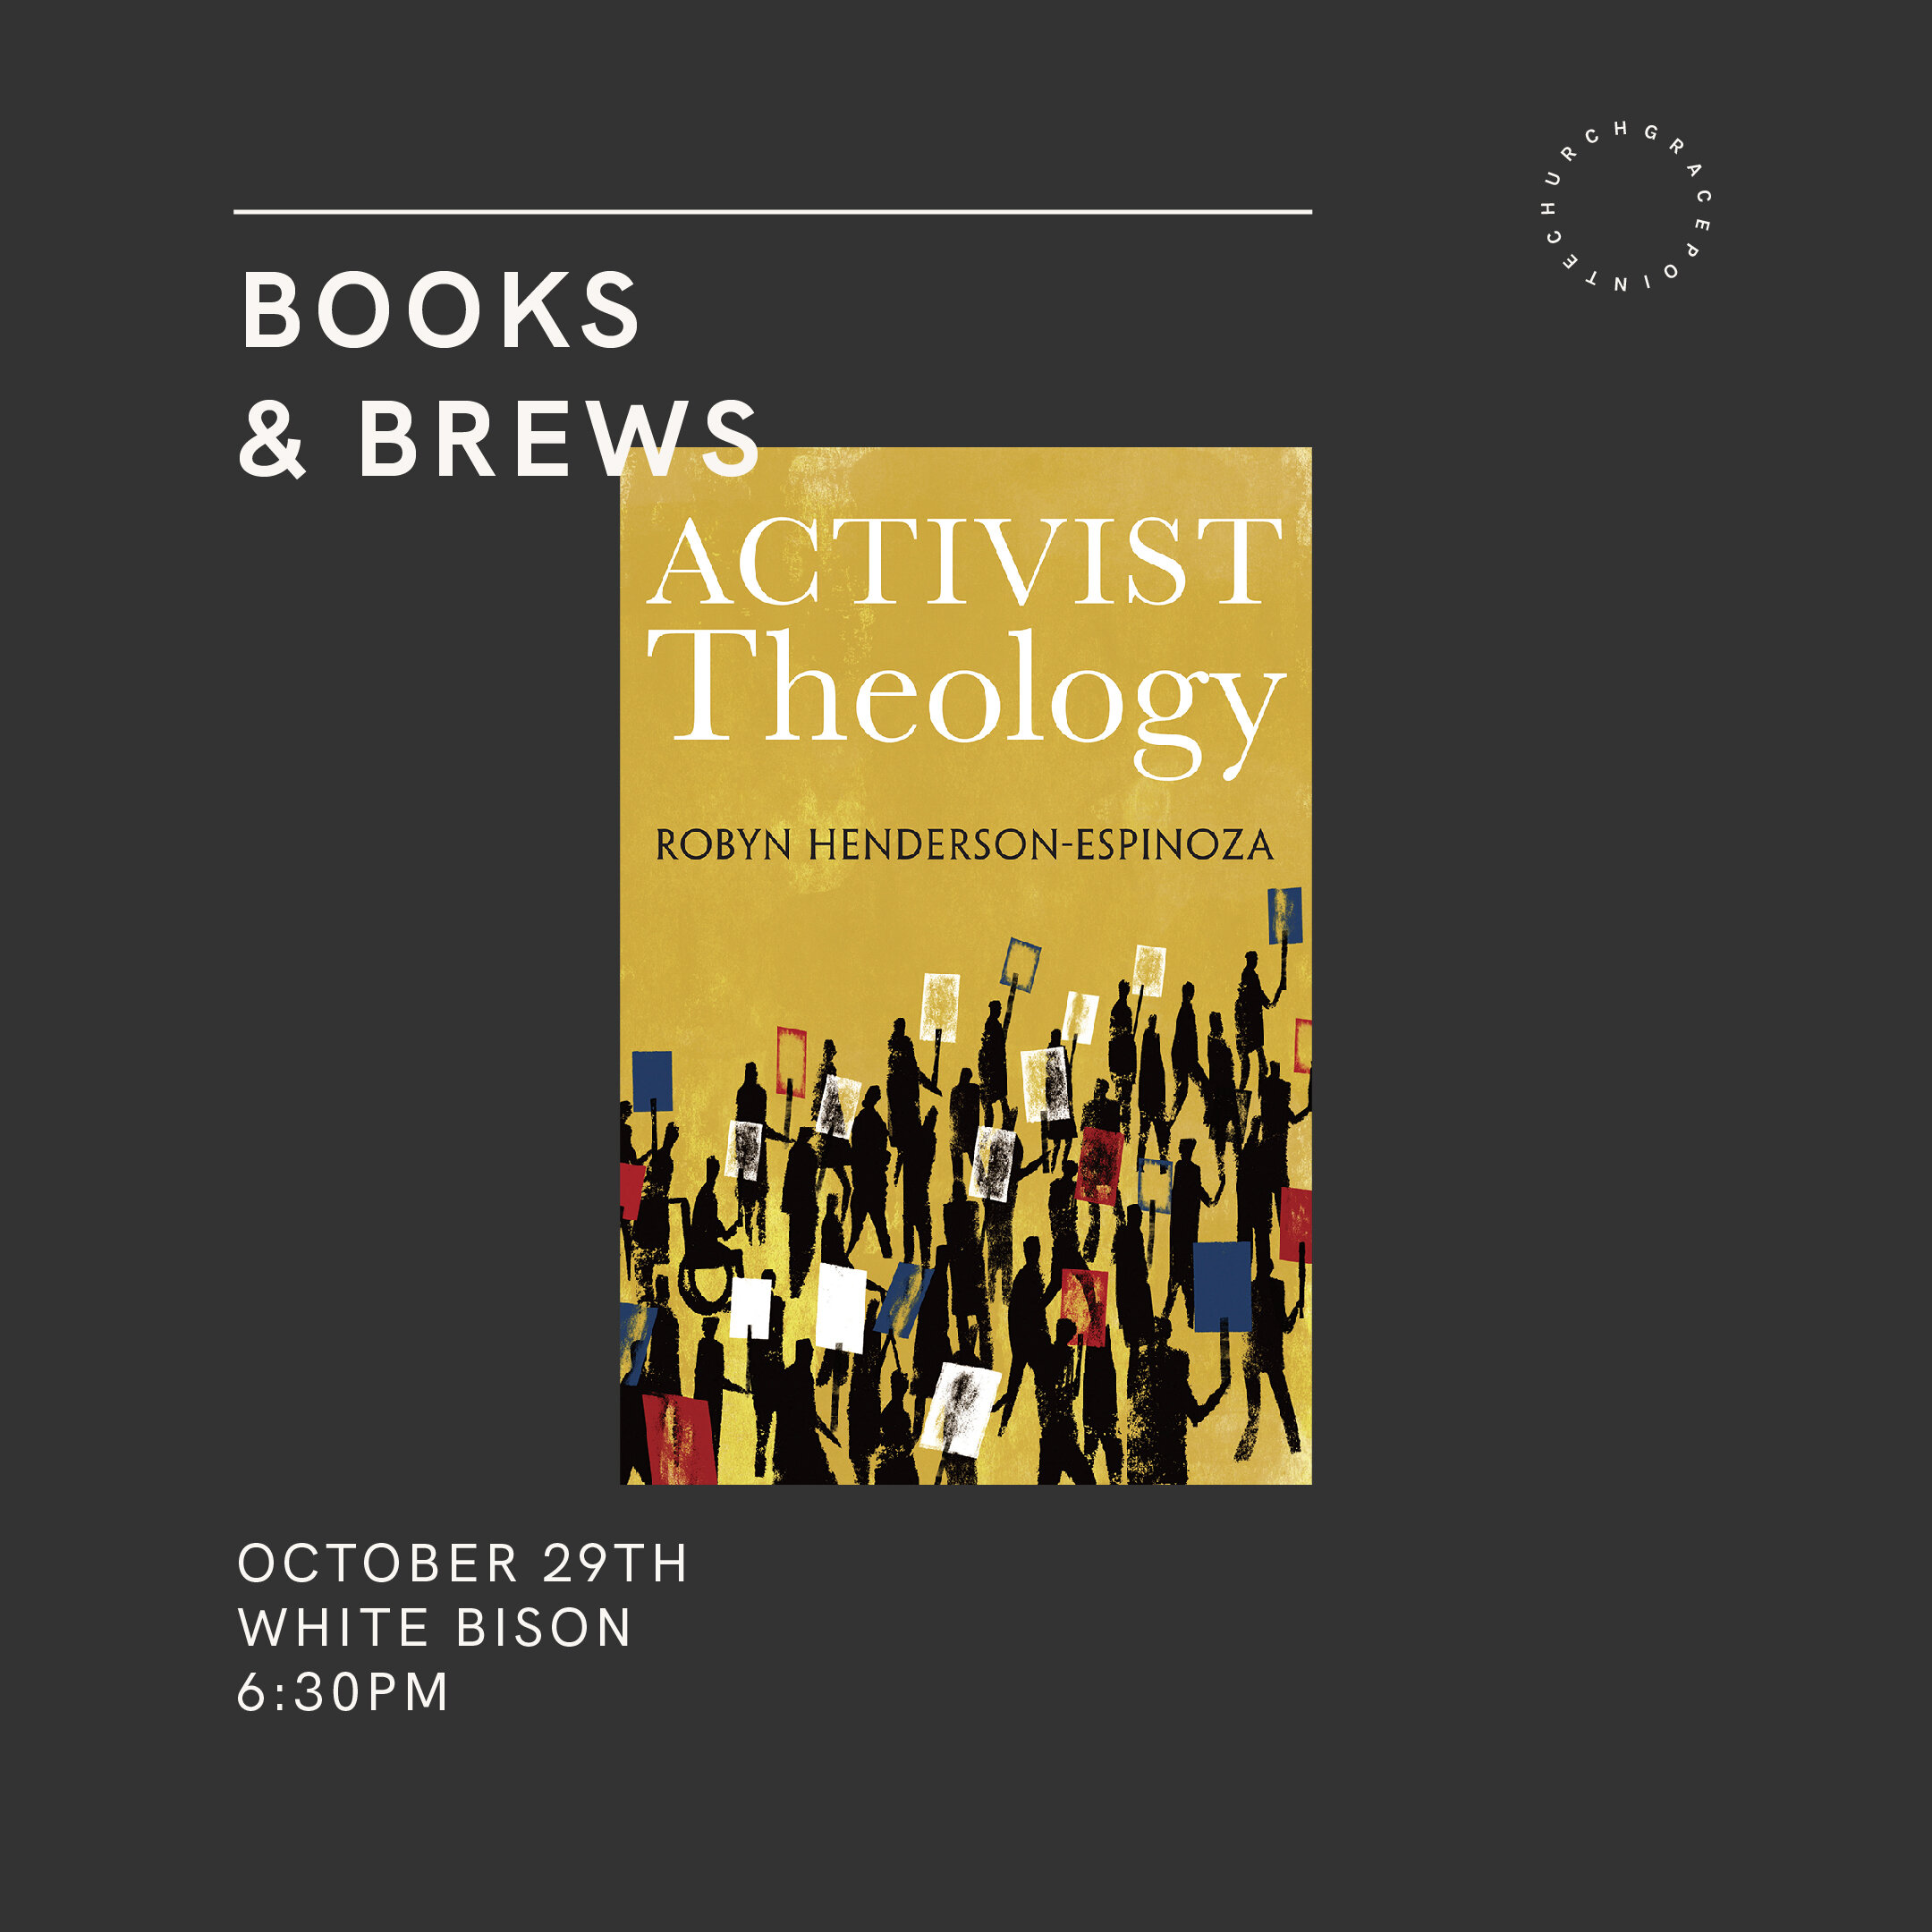 Books and Brews – Activist Theology – OctoberInstagram.jpg